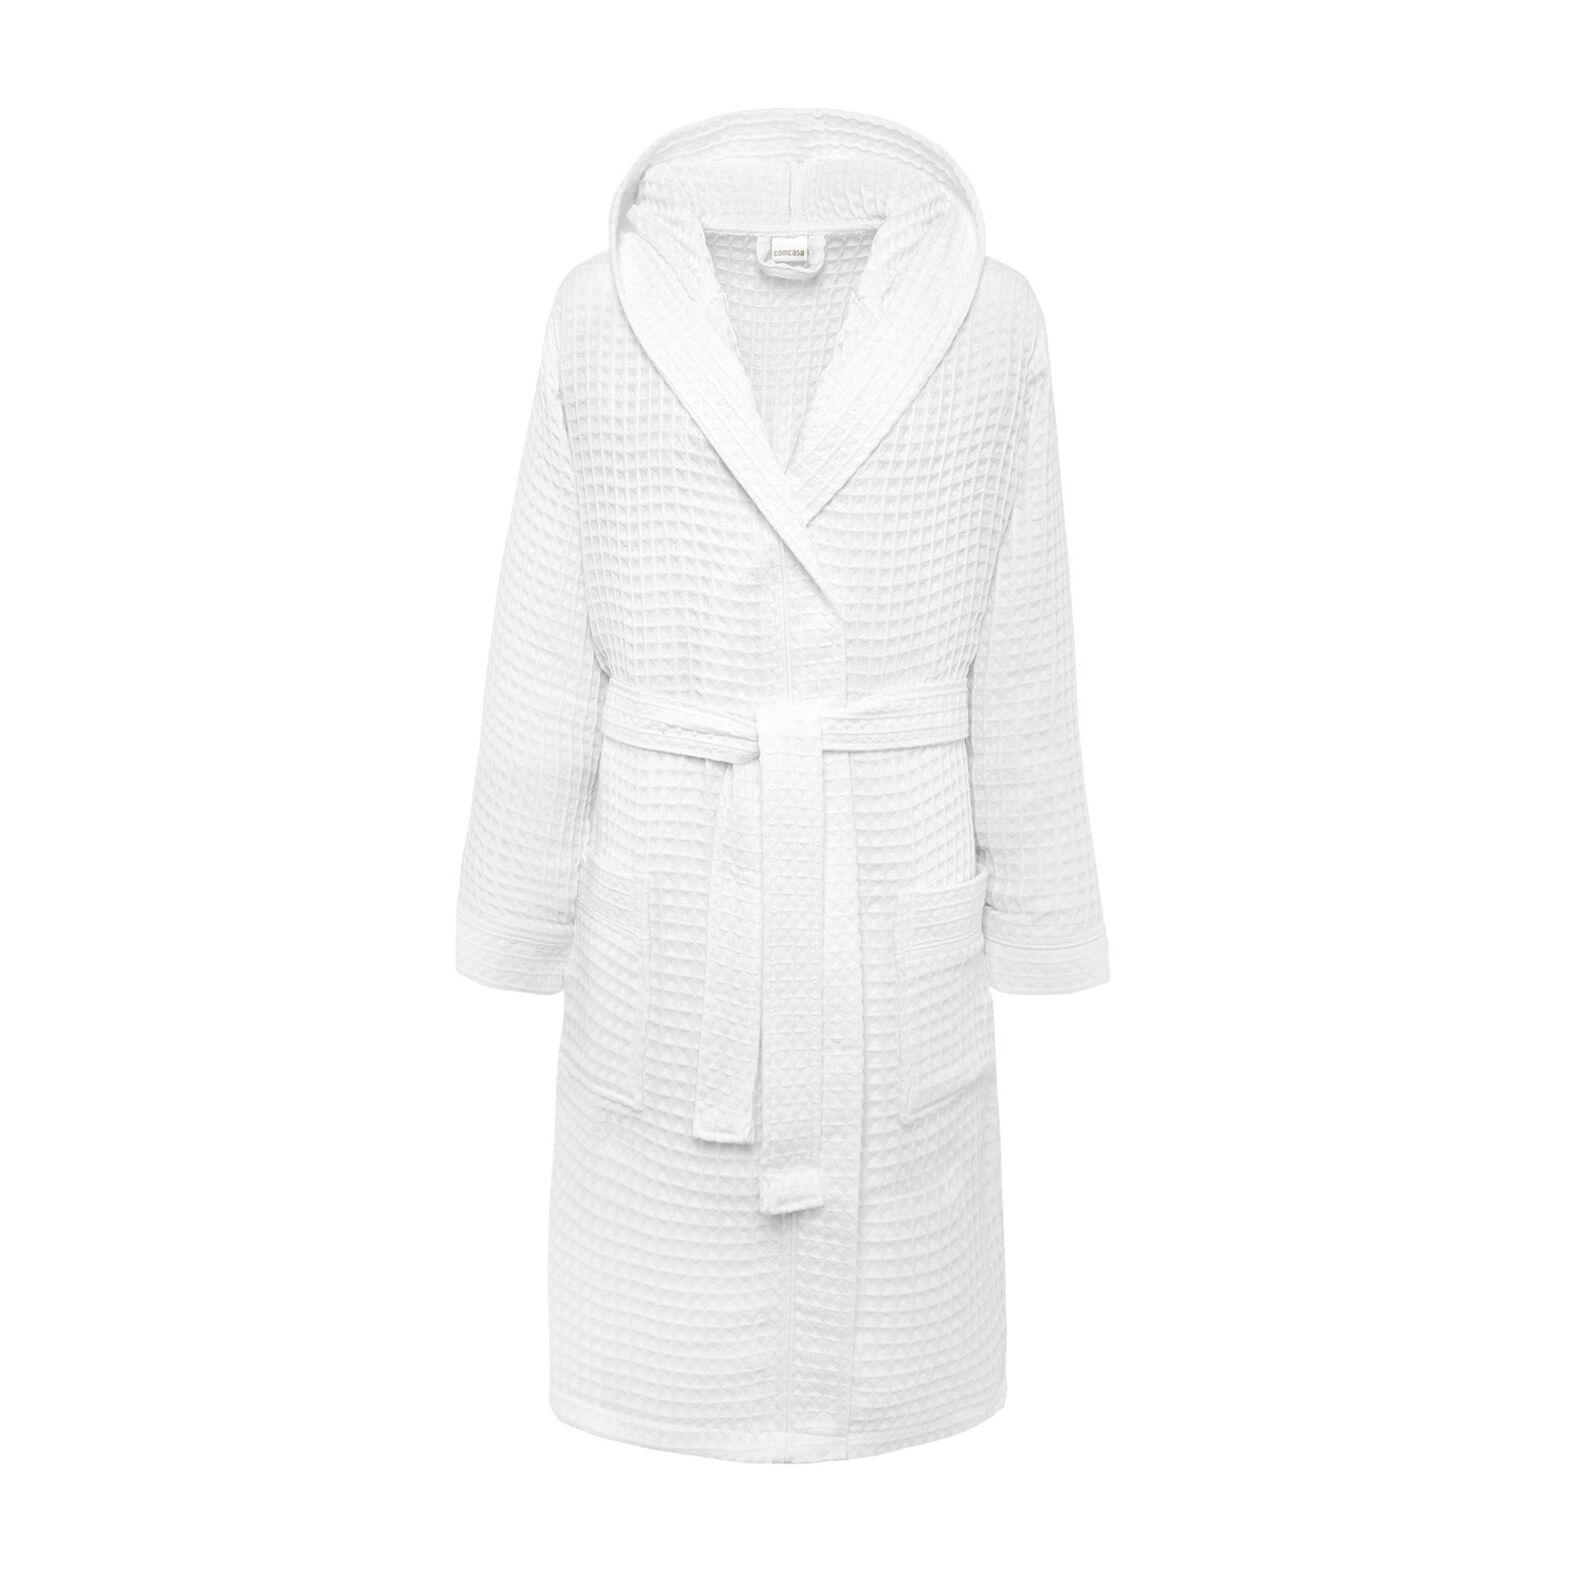 Honeycomb bathrobe in pure cotton